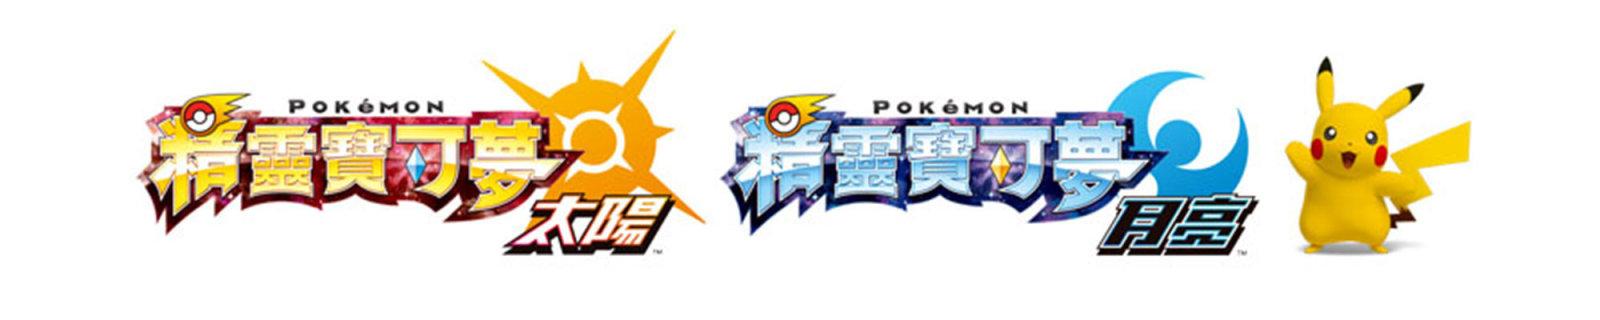 Pokémon游戏首次中文化